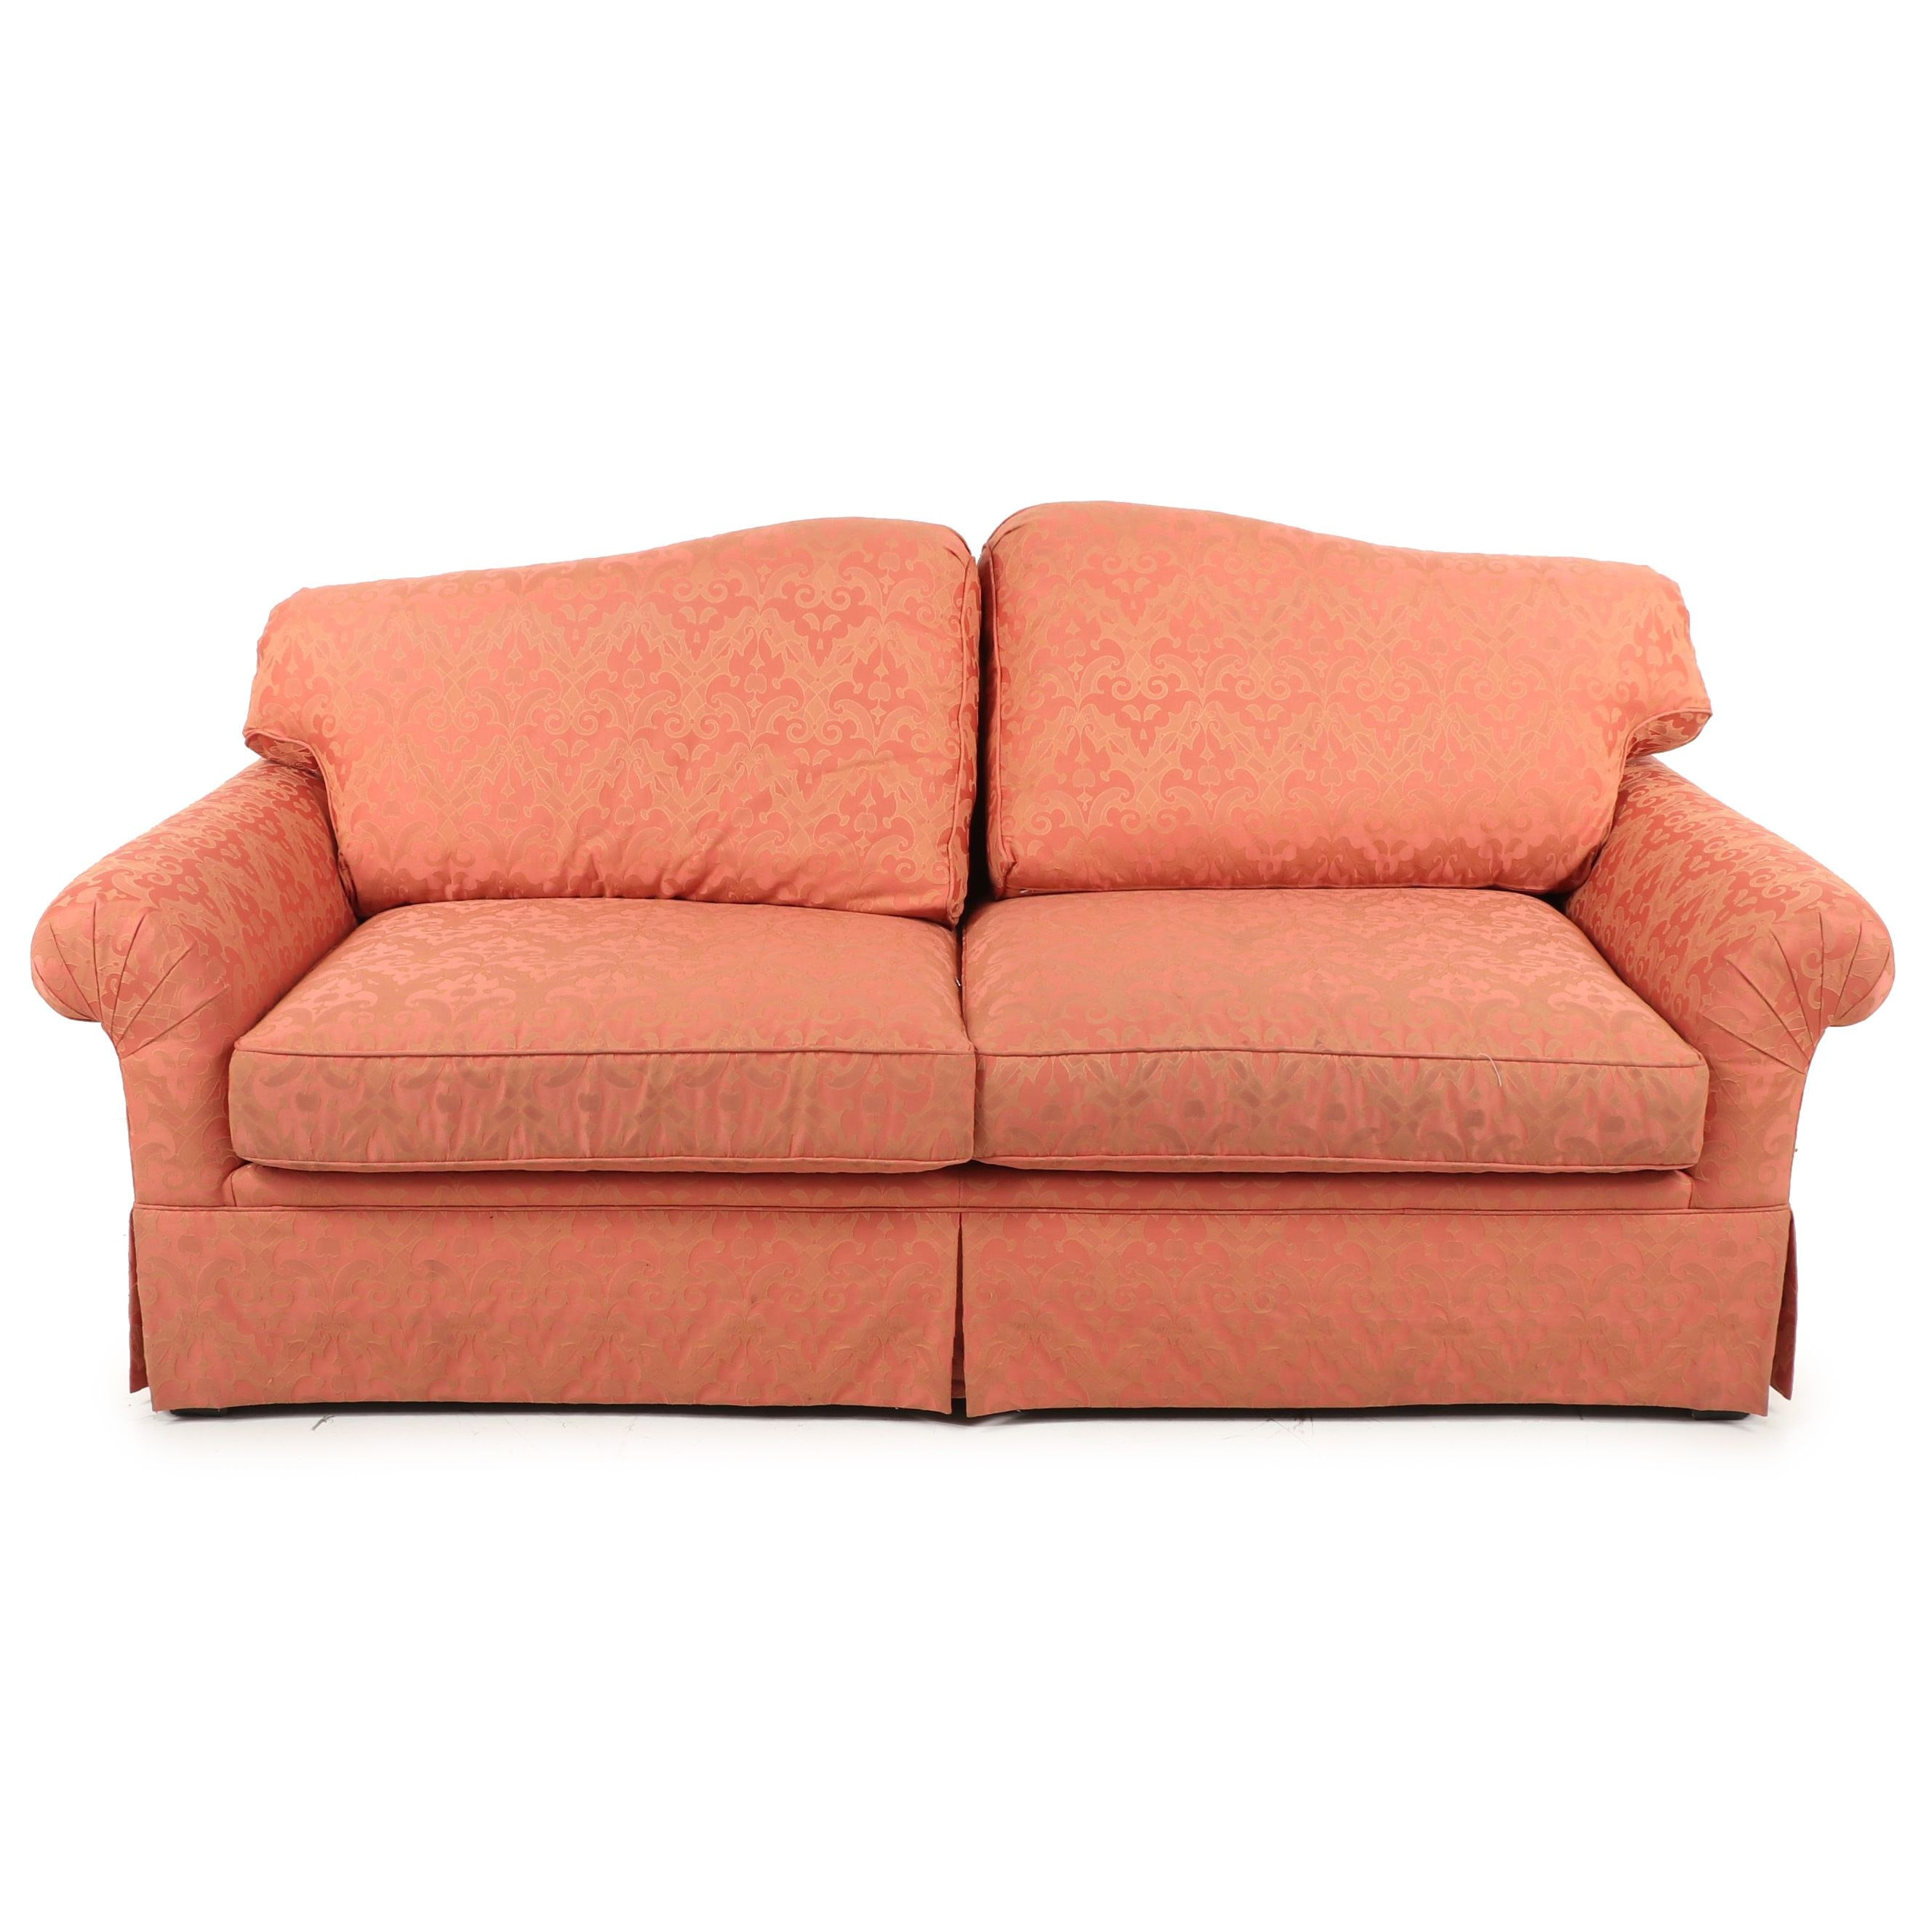 Vintage Salmon toned Sofa